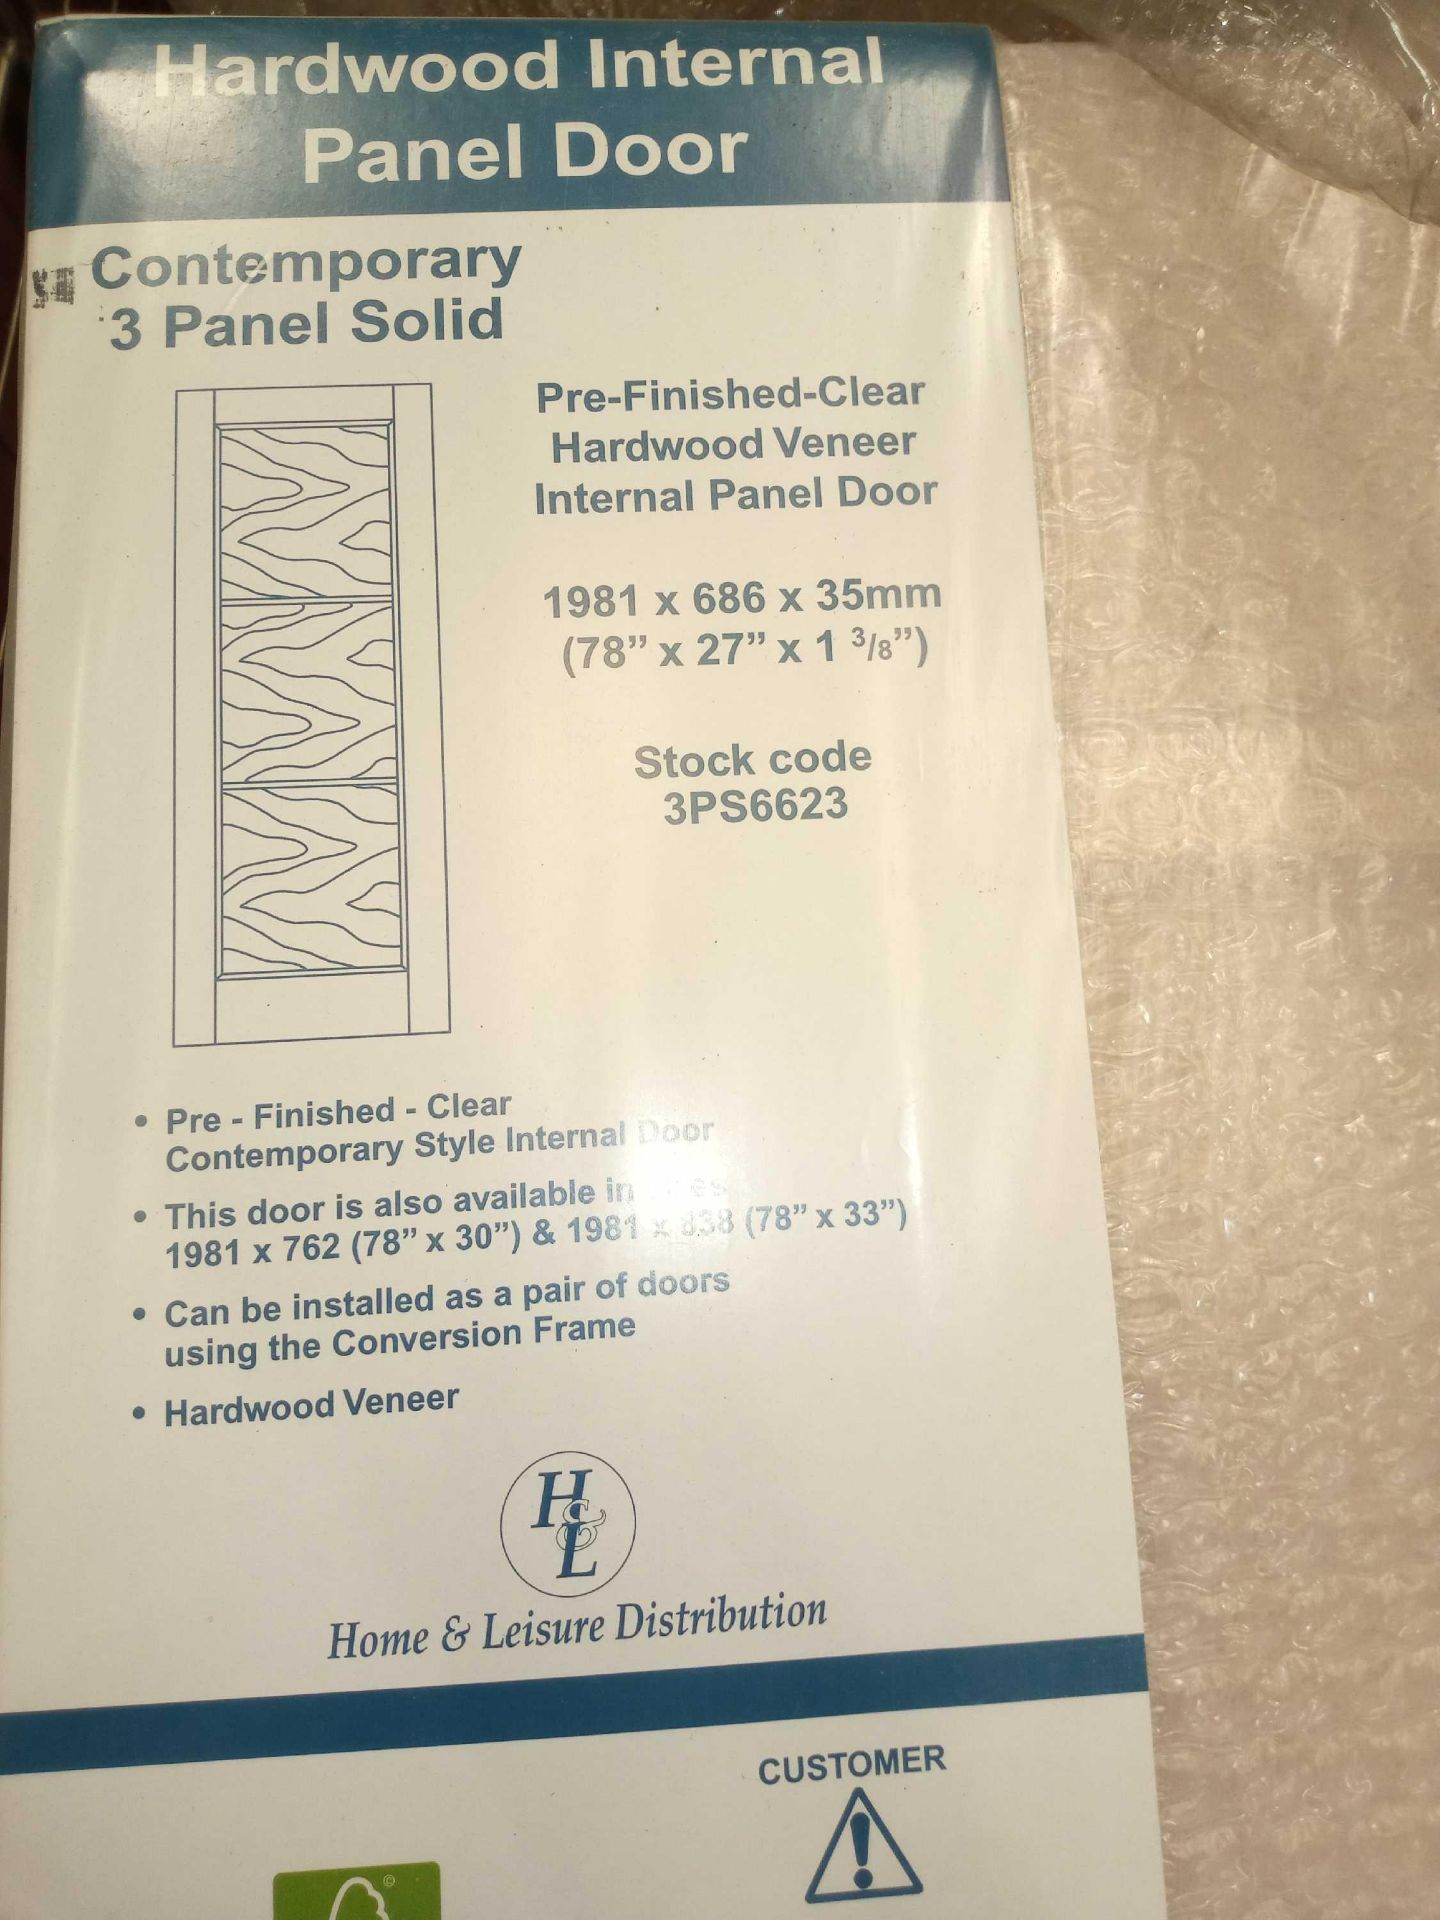 Rrp £4025 Brand New 3 Panel Solid Doors - Image 2 of 3